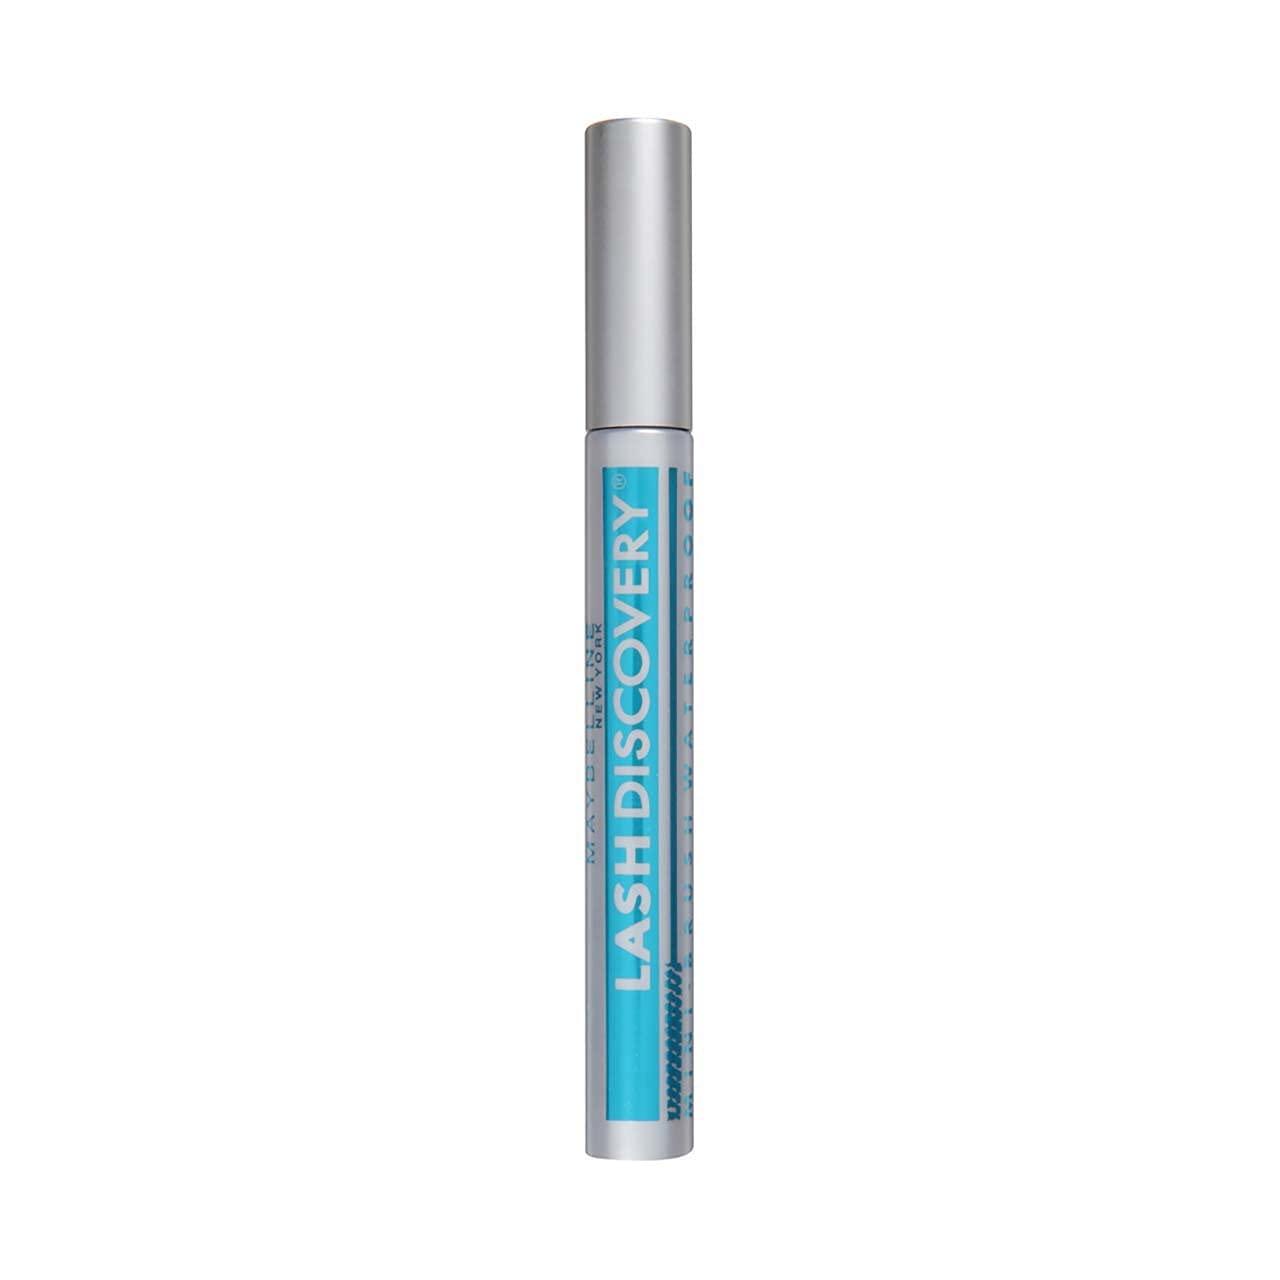 Maybelline New York Lash Discovery Waterproof Mascara, Very Blac